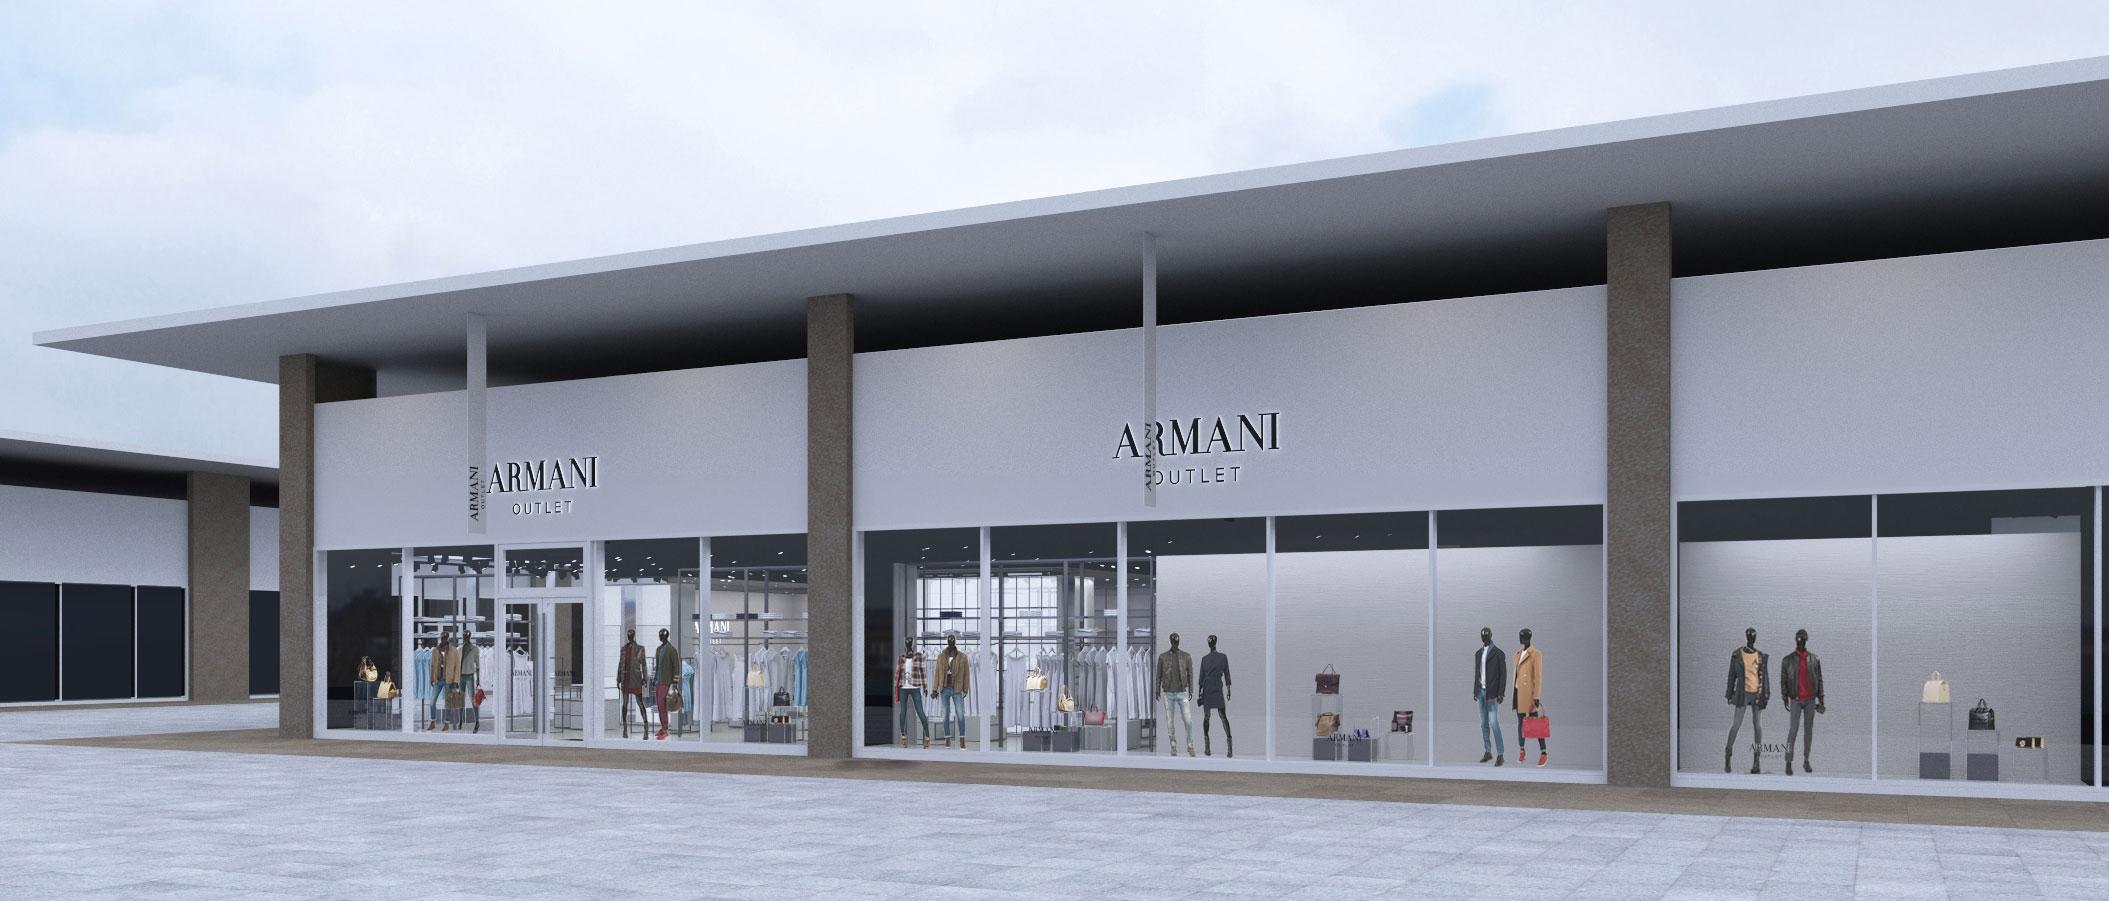 Milan Armani outlet refurbishment - outlet settimo torinese ...